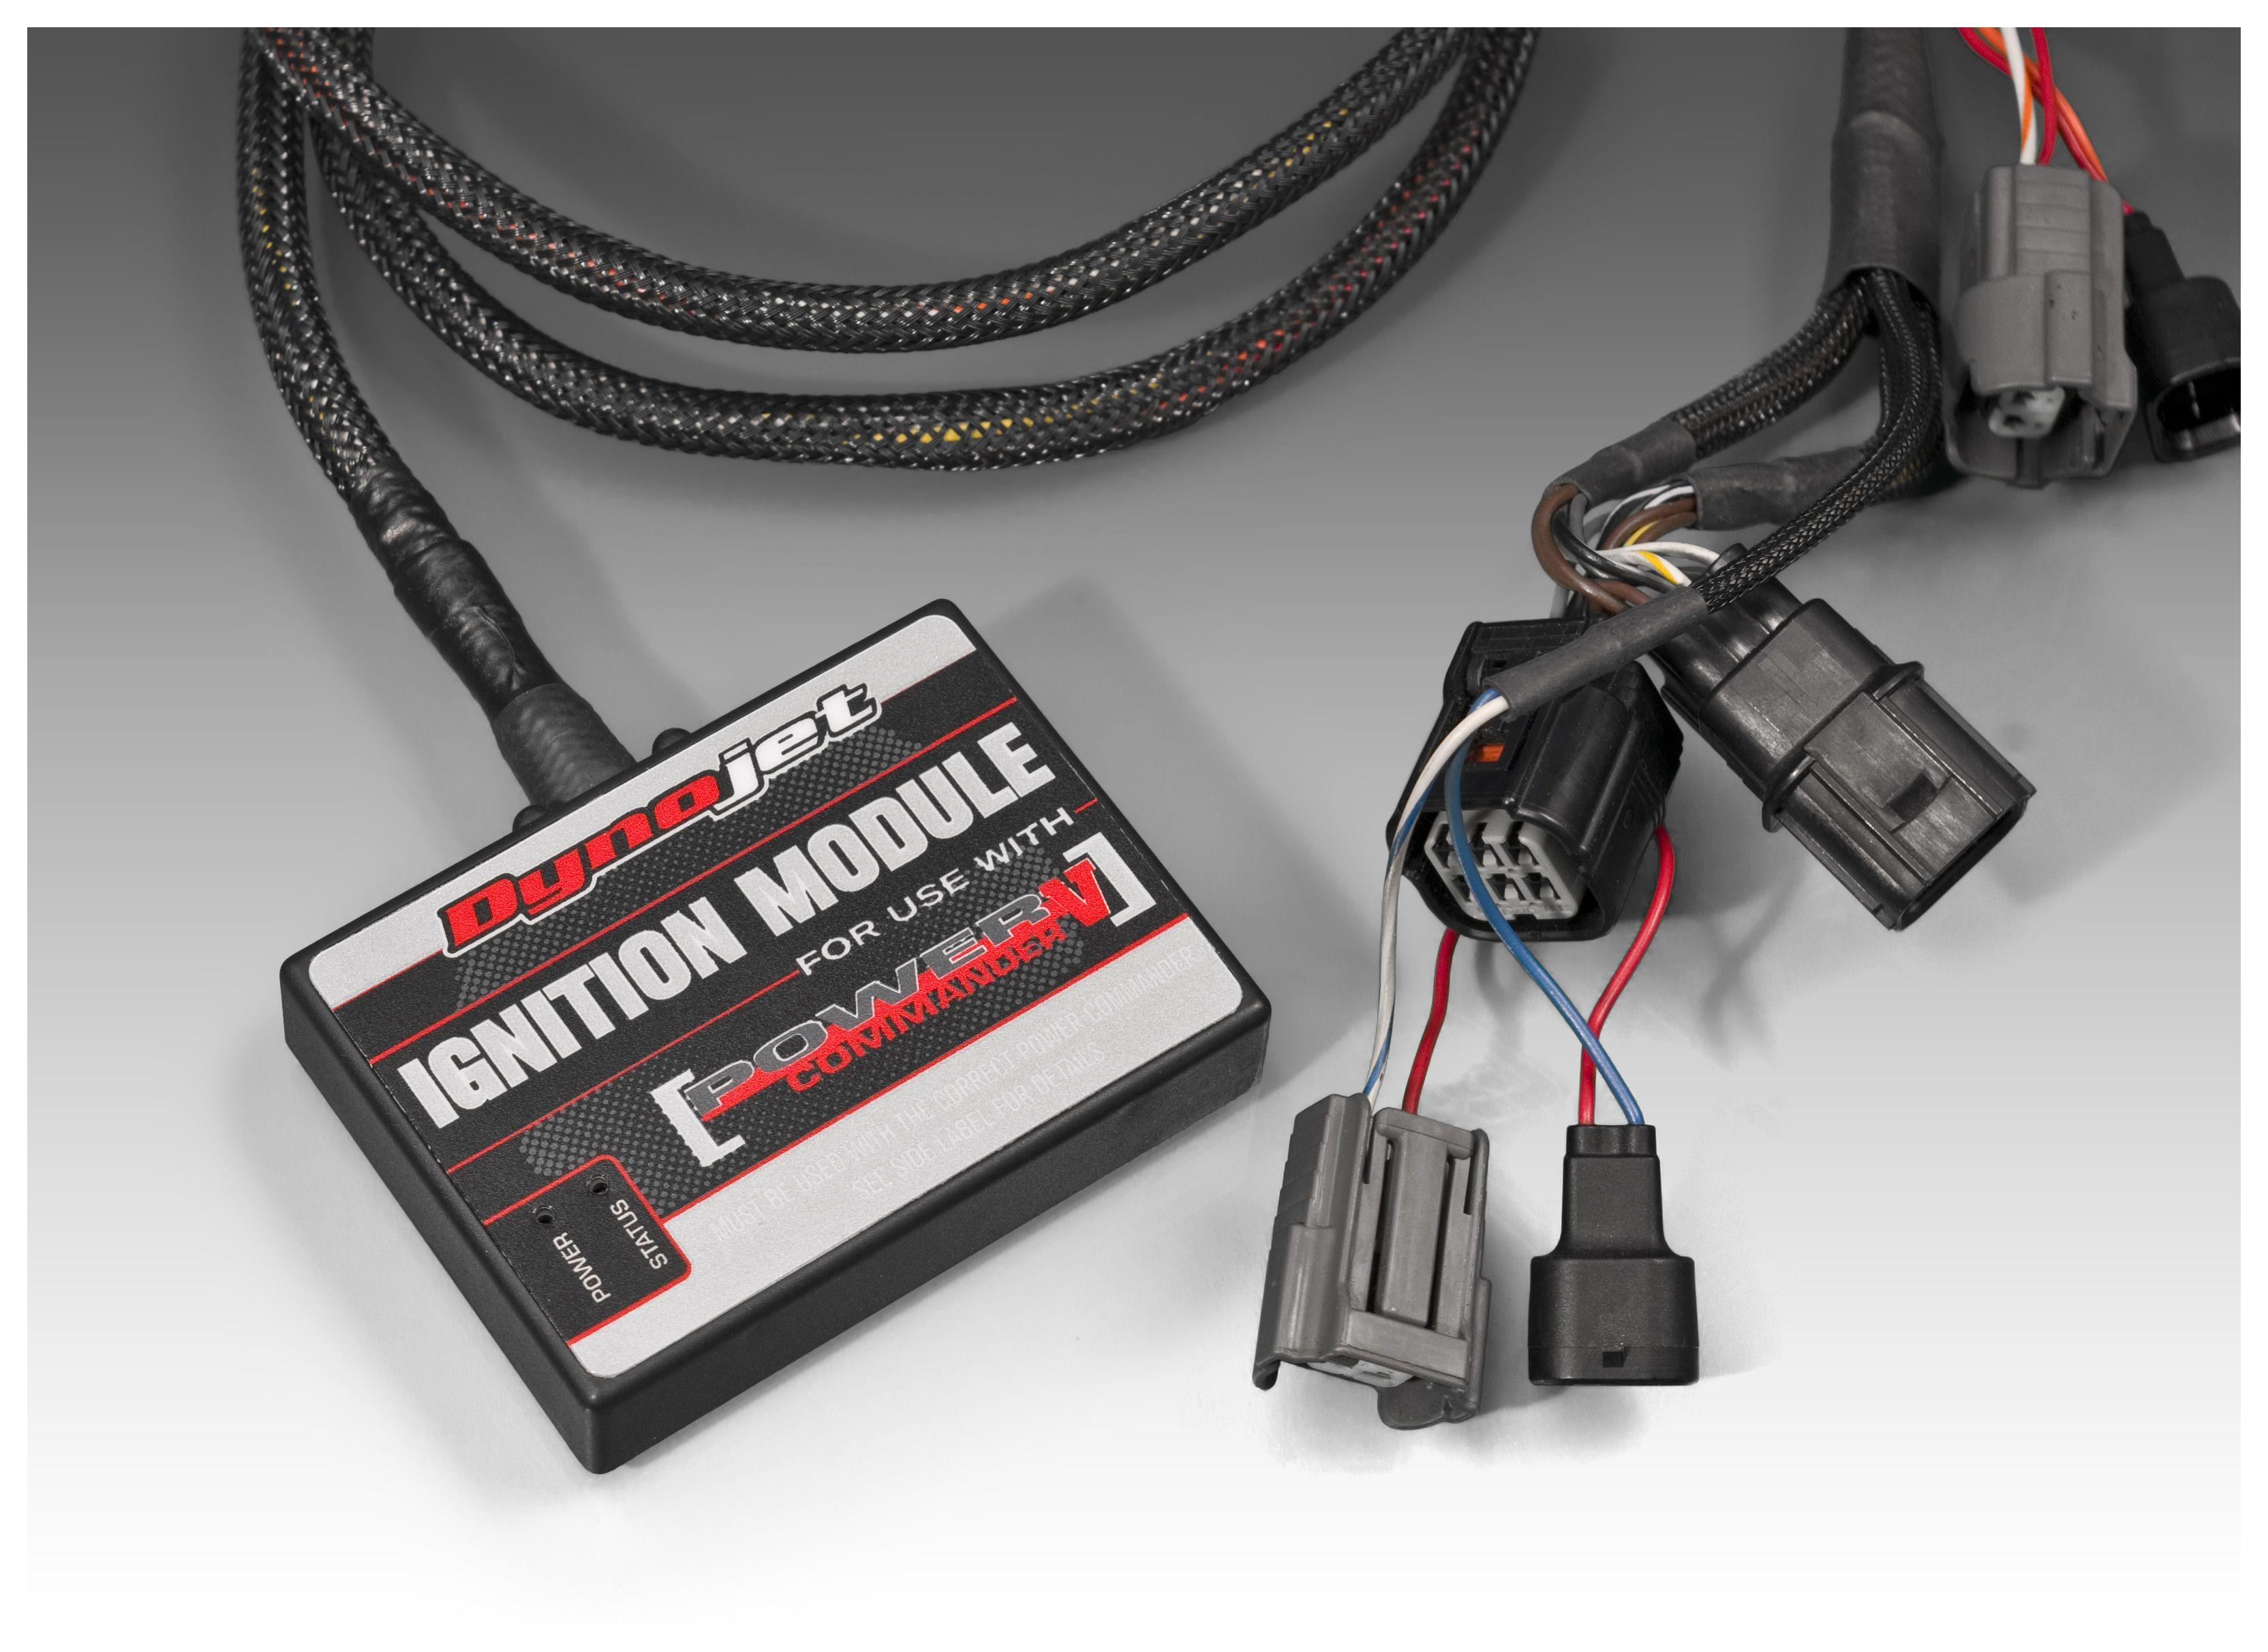 Dynojet Power Commander V Ignition Module Suzuki Hayabusa / BKing | 15%  ($53 99) Off!